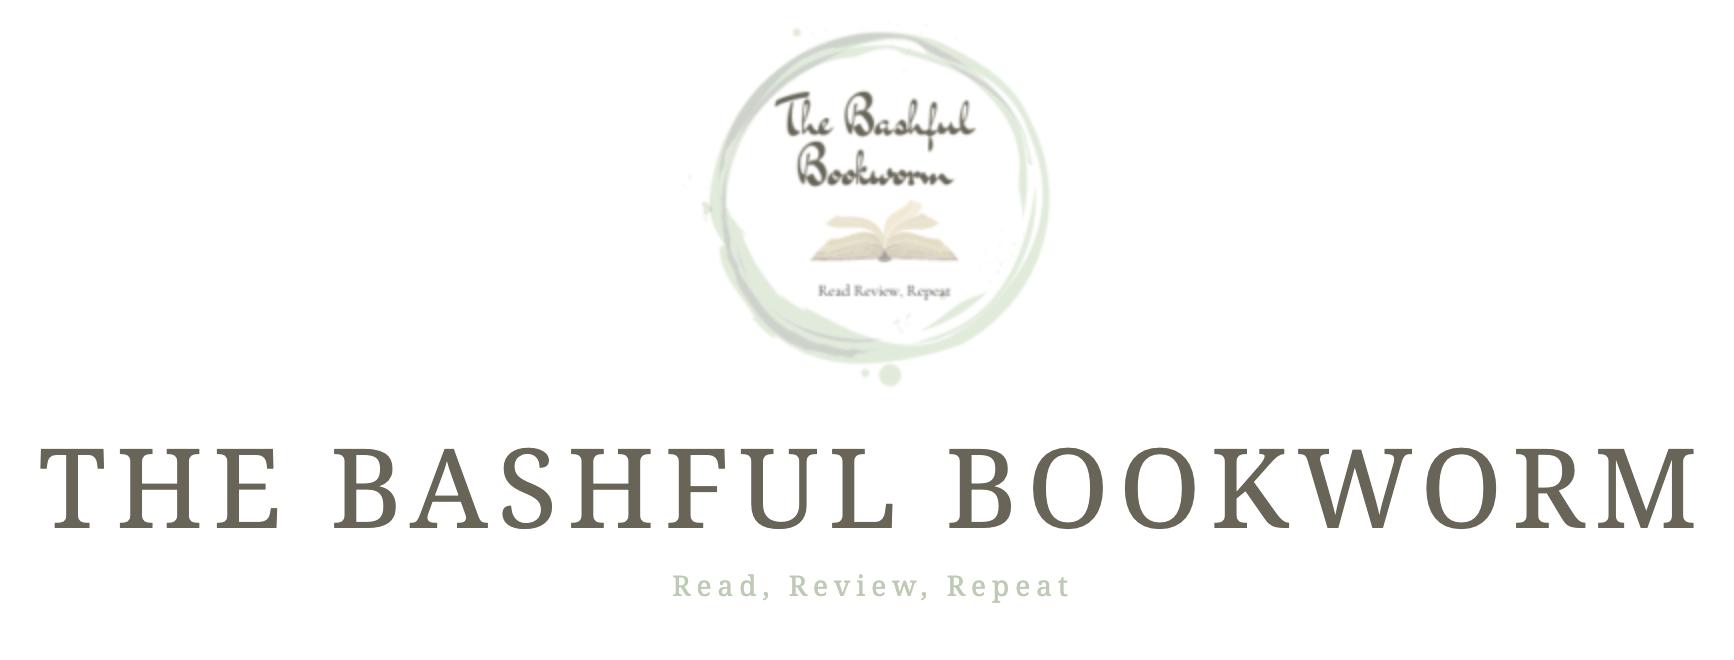 The Bashful Bookworm